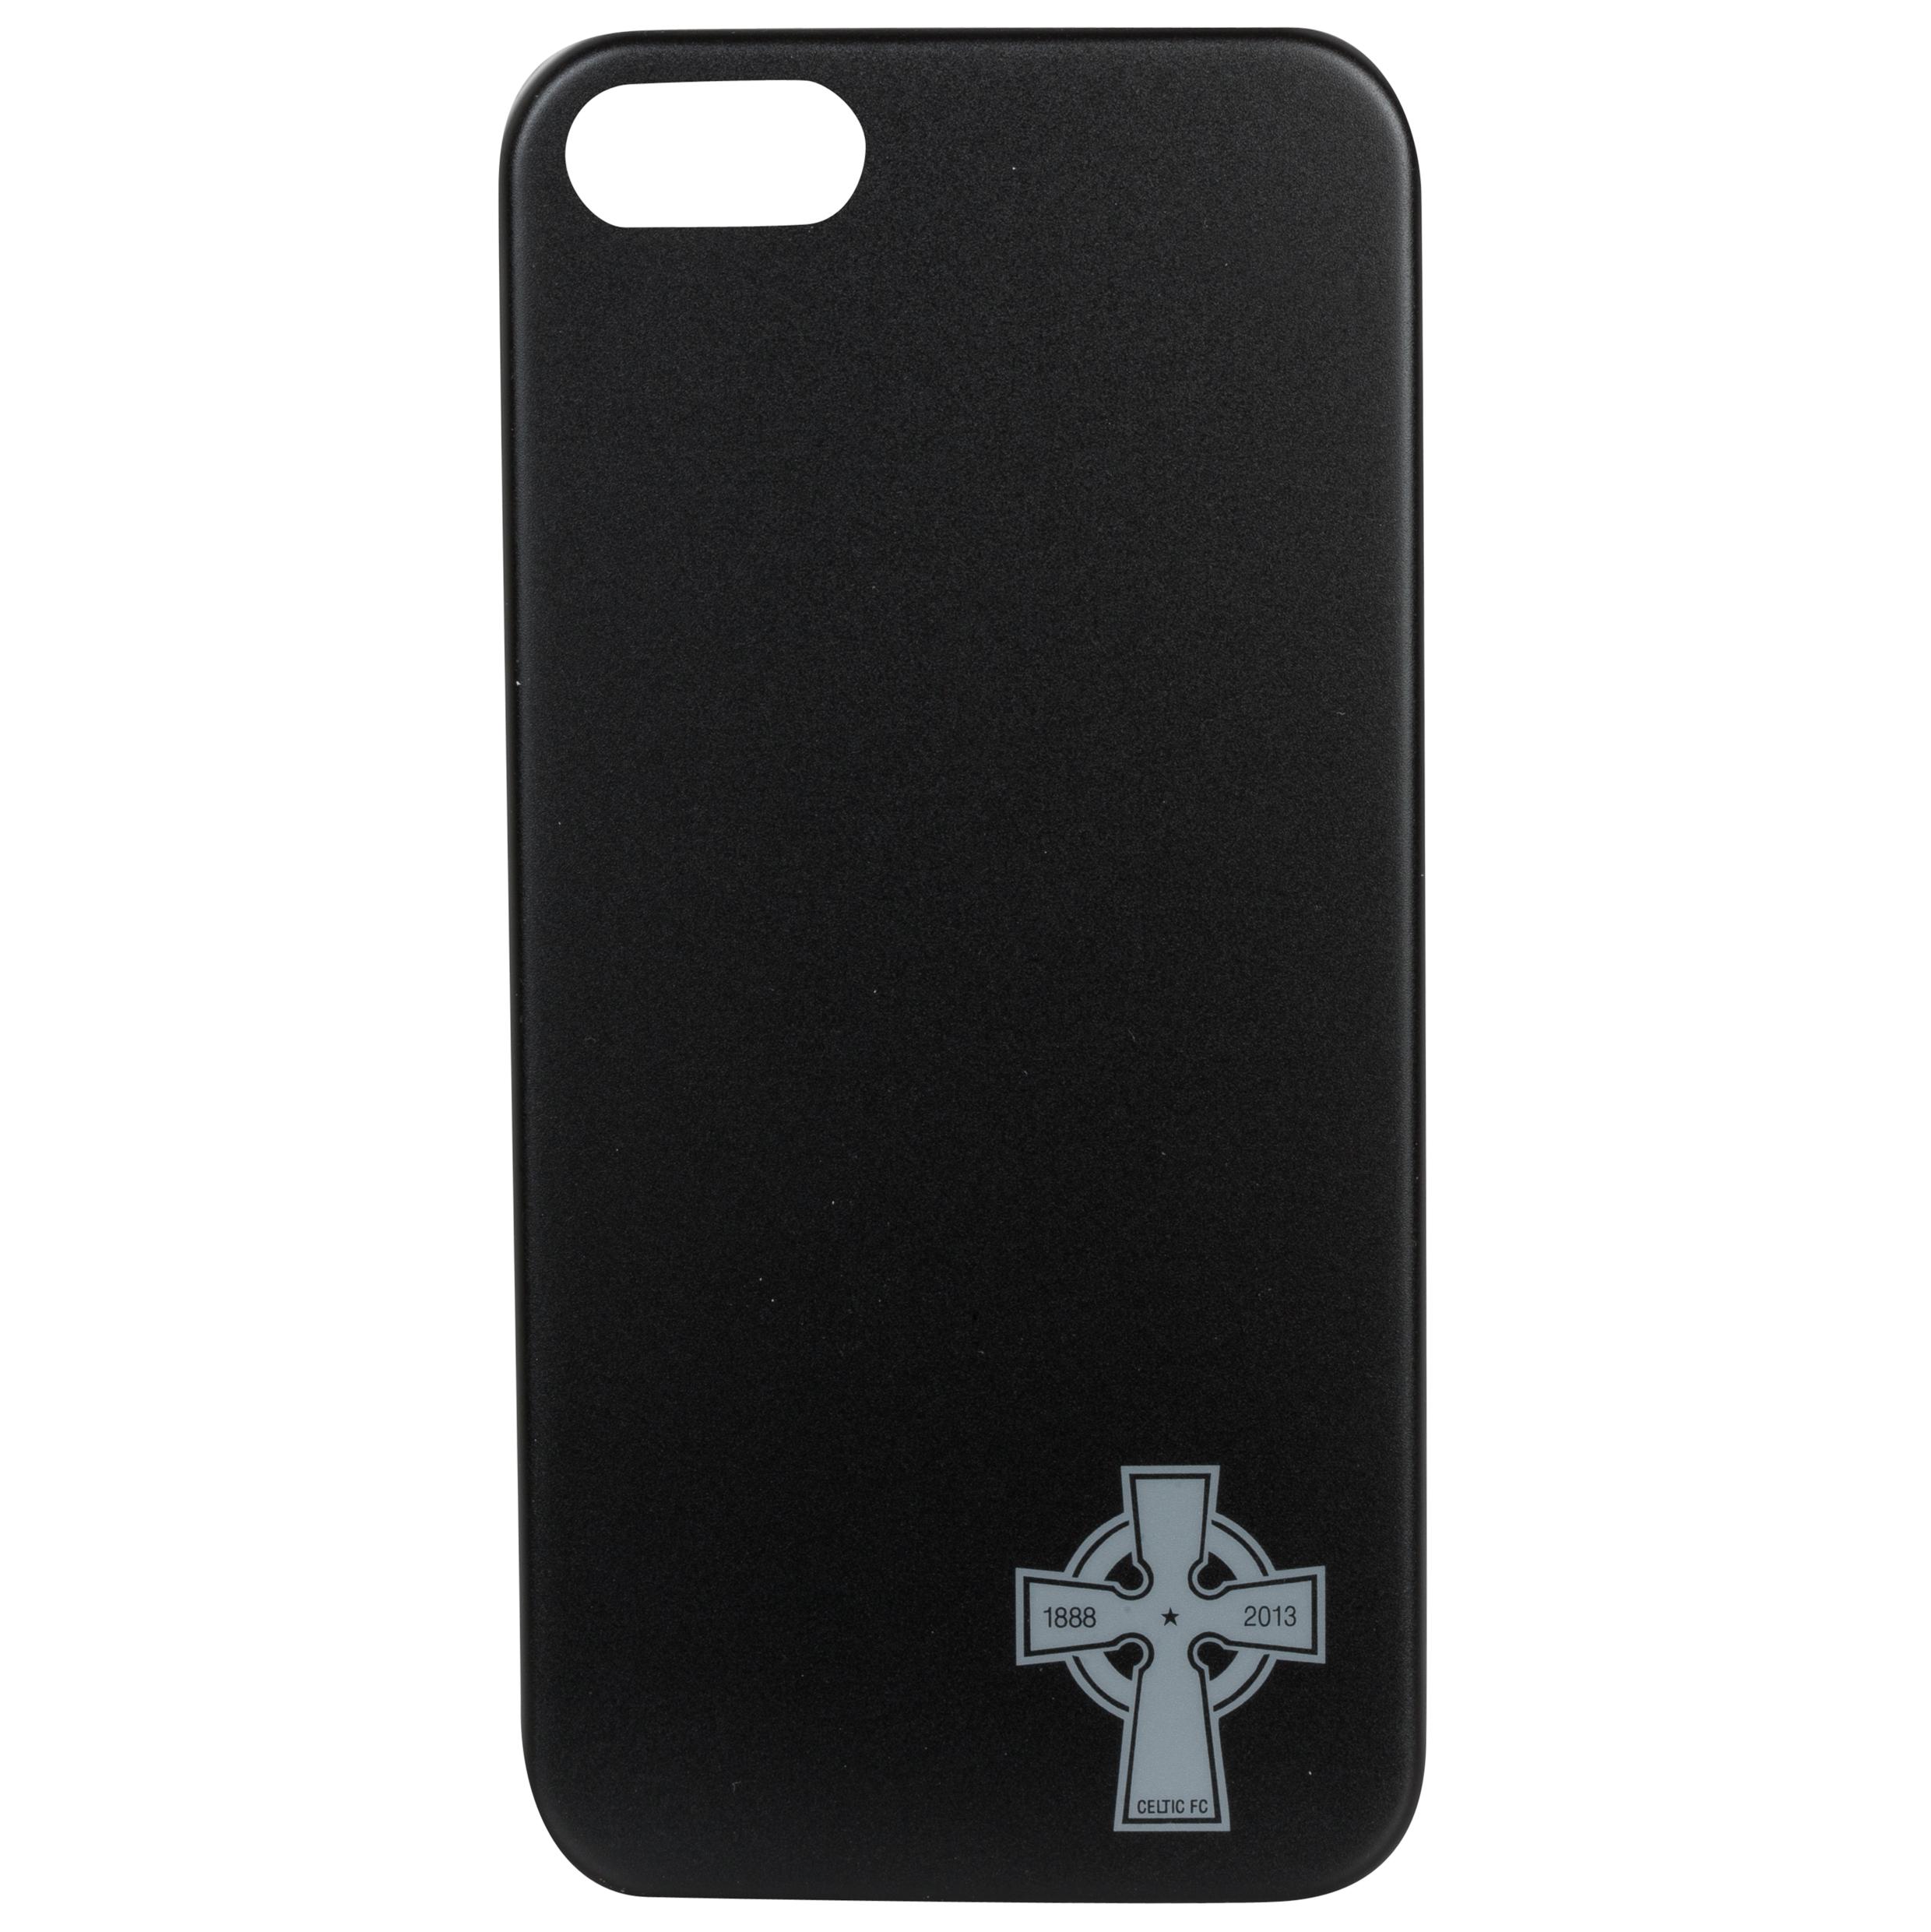 Celtic Iphone 5 Cross Hard Case - Black